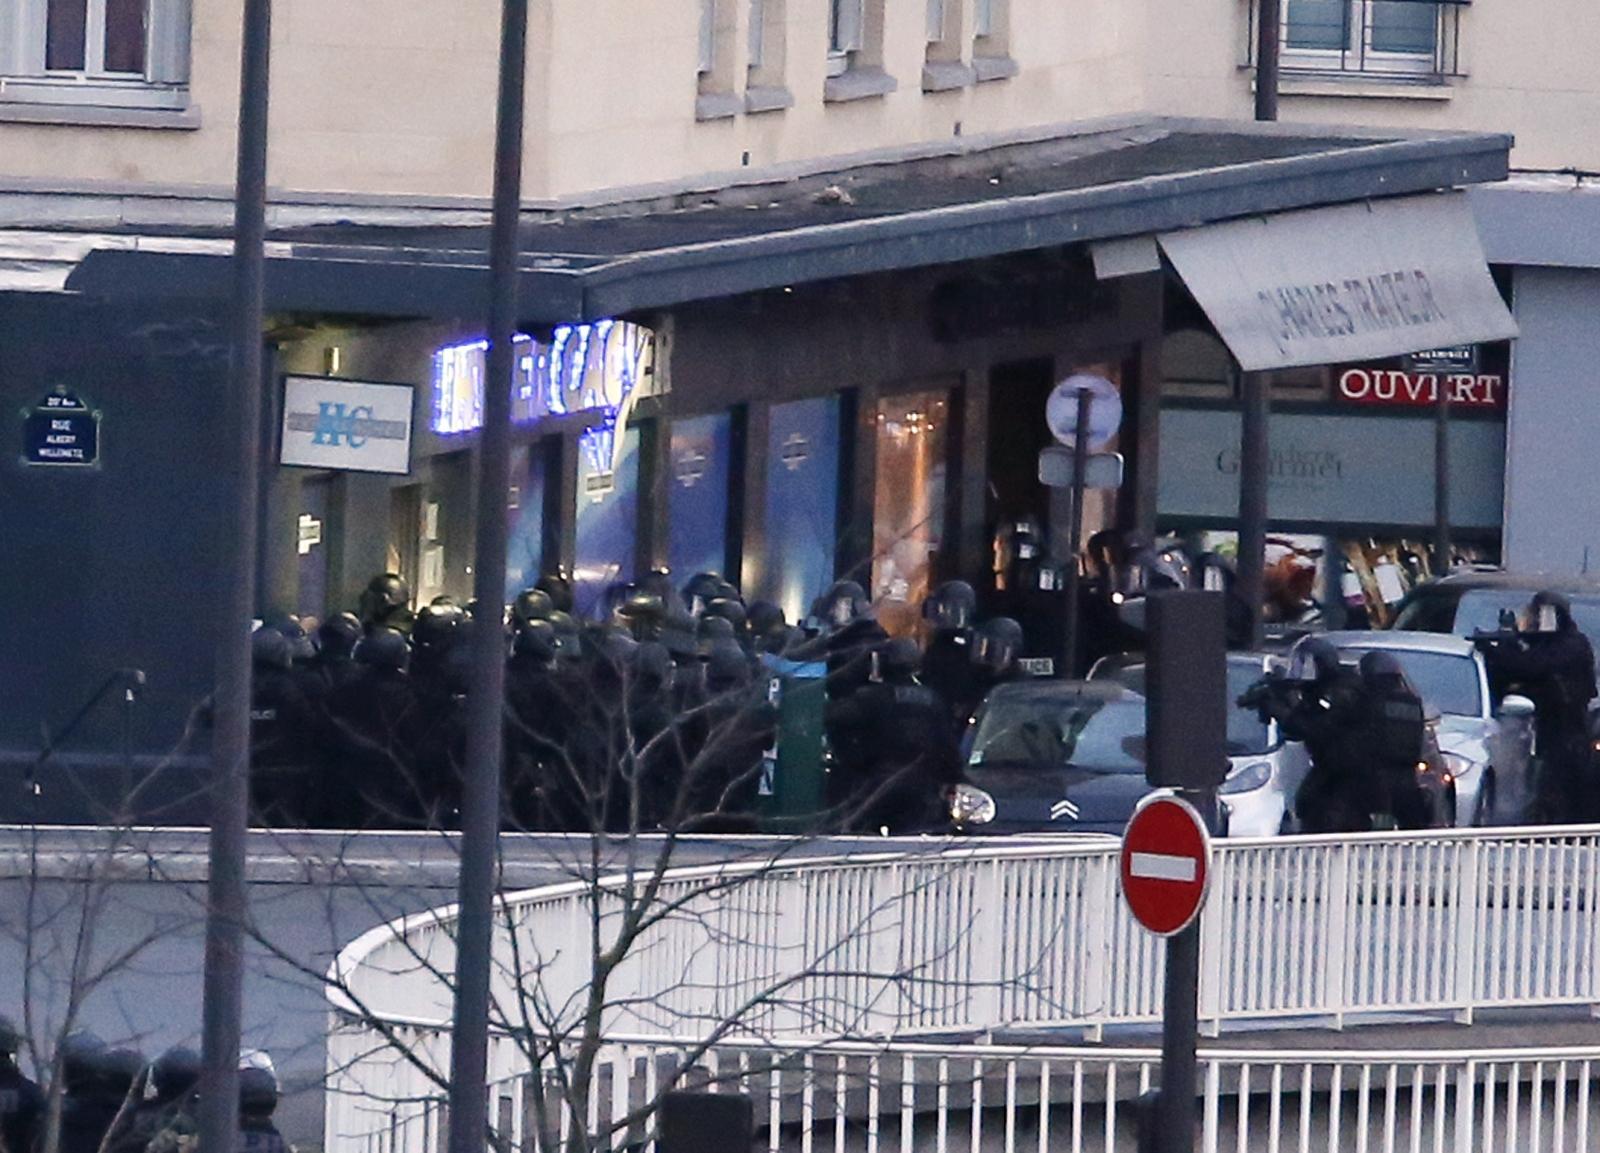 Paris grocery siege: French forces storm supermarket